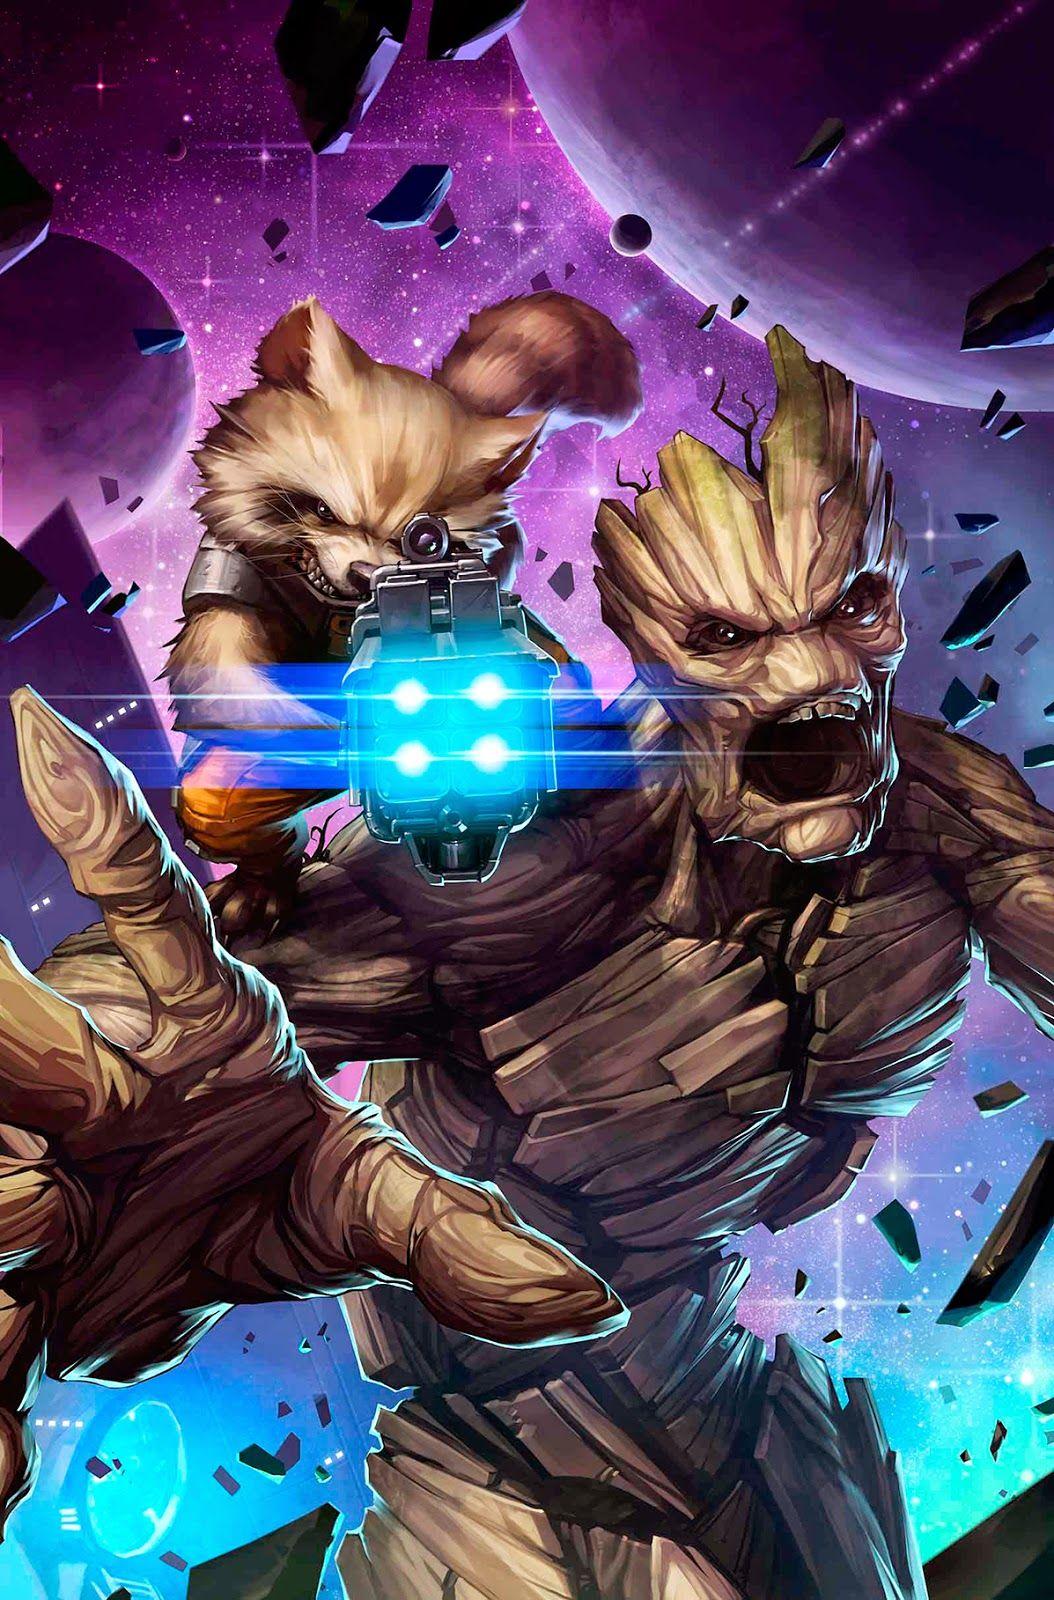 Beautiful Wallpaper Marvel Guardians The Galaxy - c76c6f33e9e81bb6d98105aaad5e6dbb  Image_982031.jpg